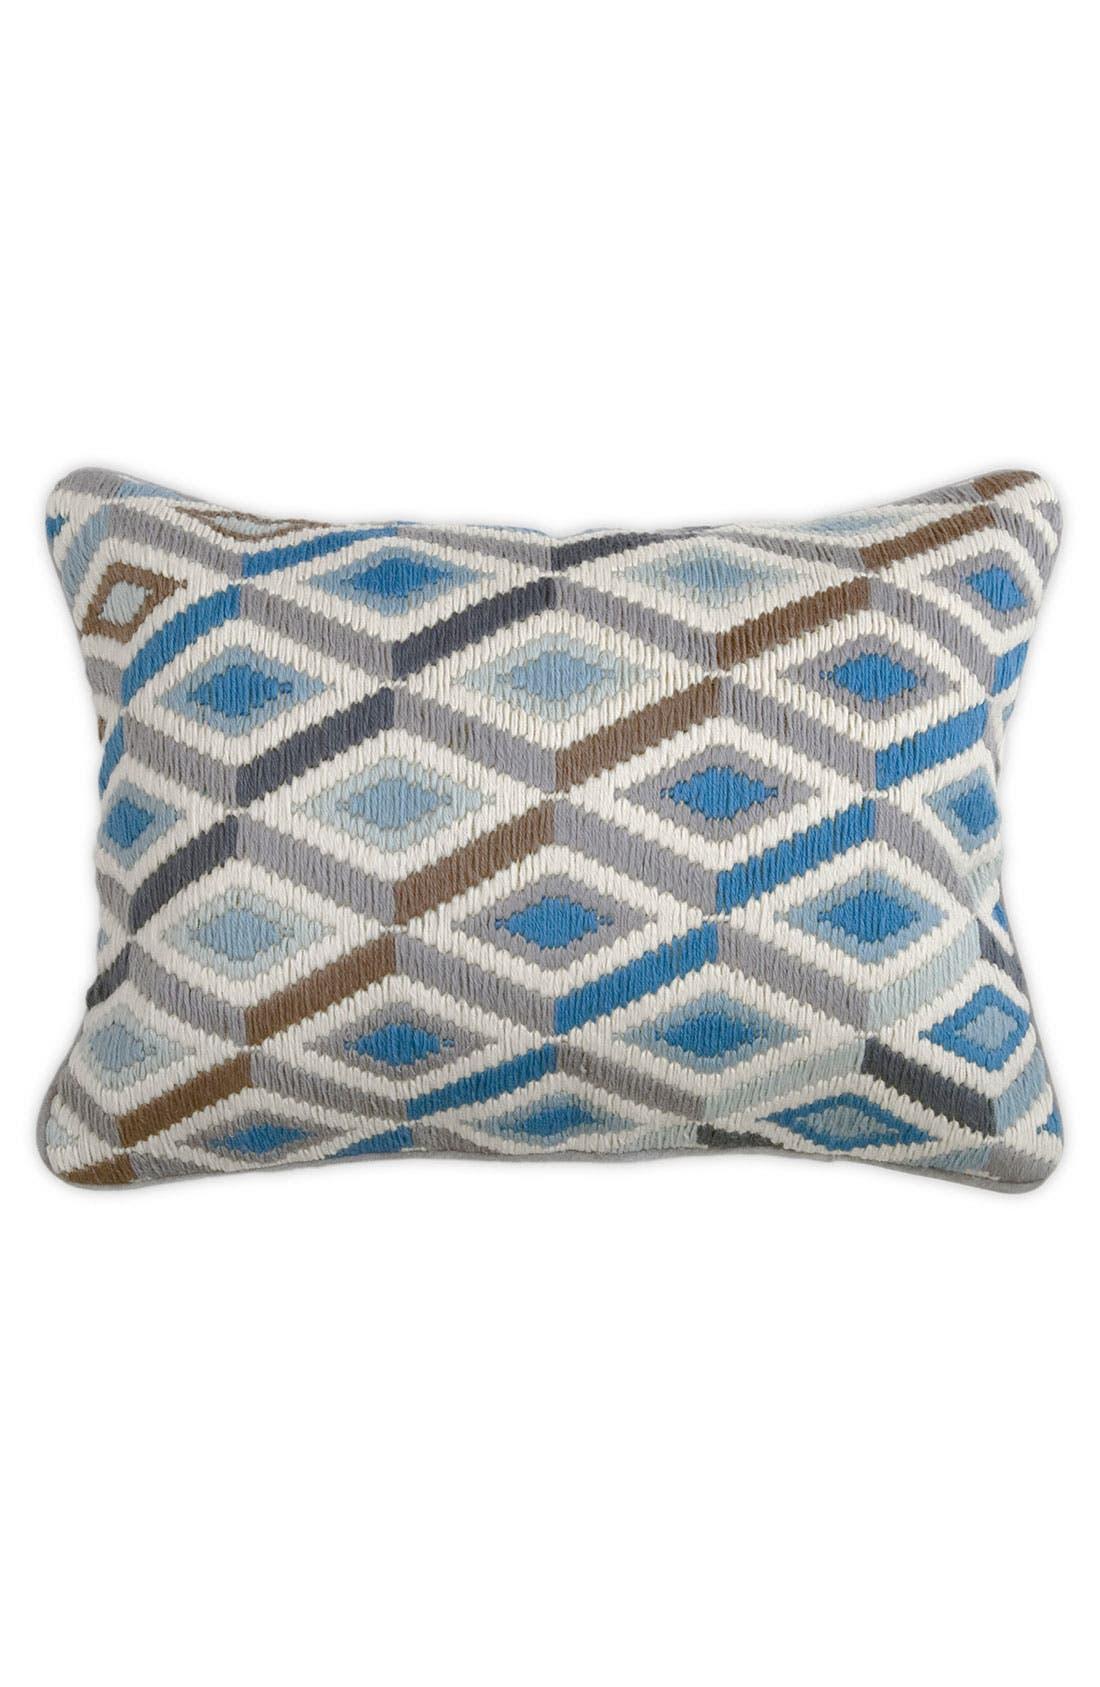 Main Image - Jonathan Adler 'Diamonds' Pillow